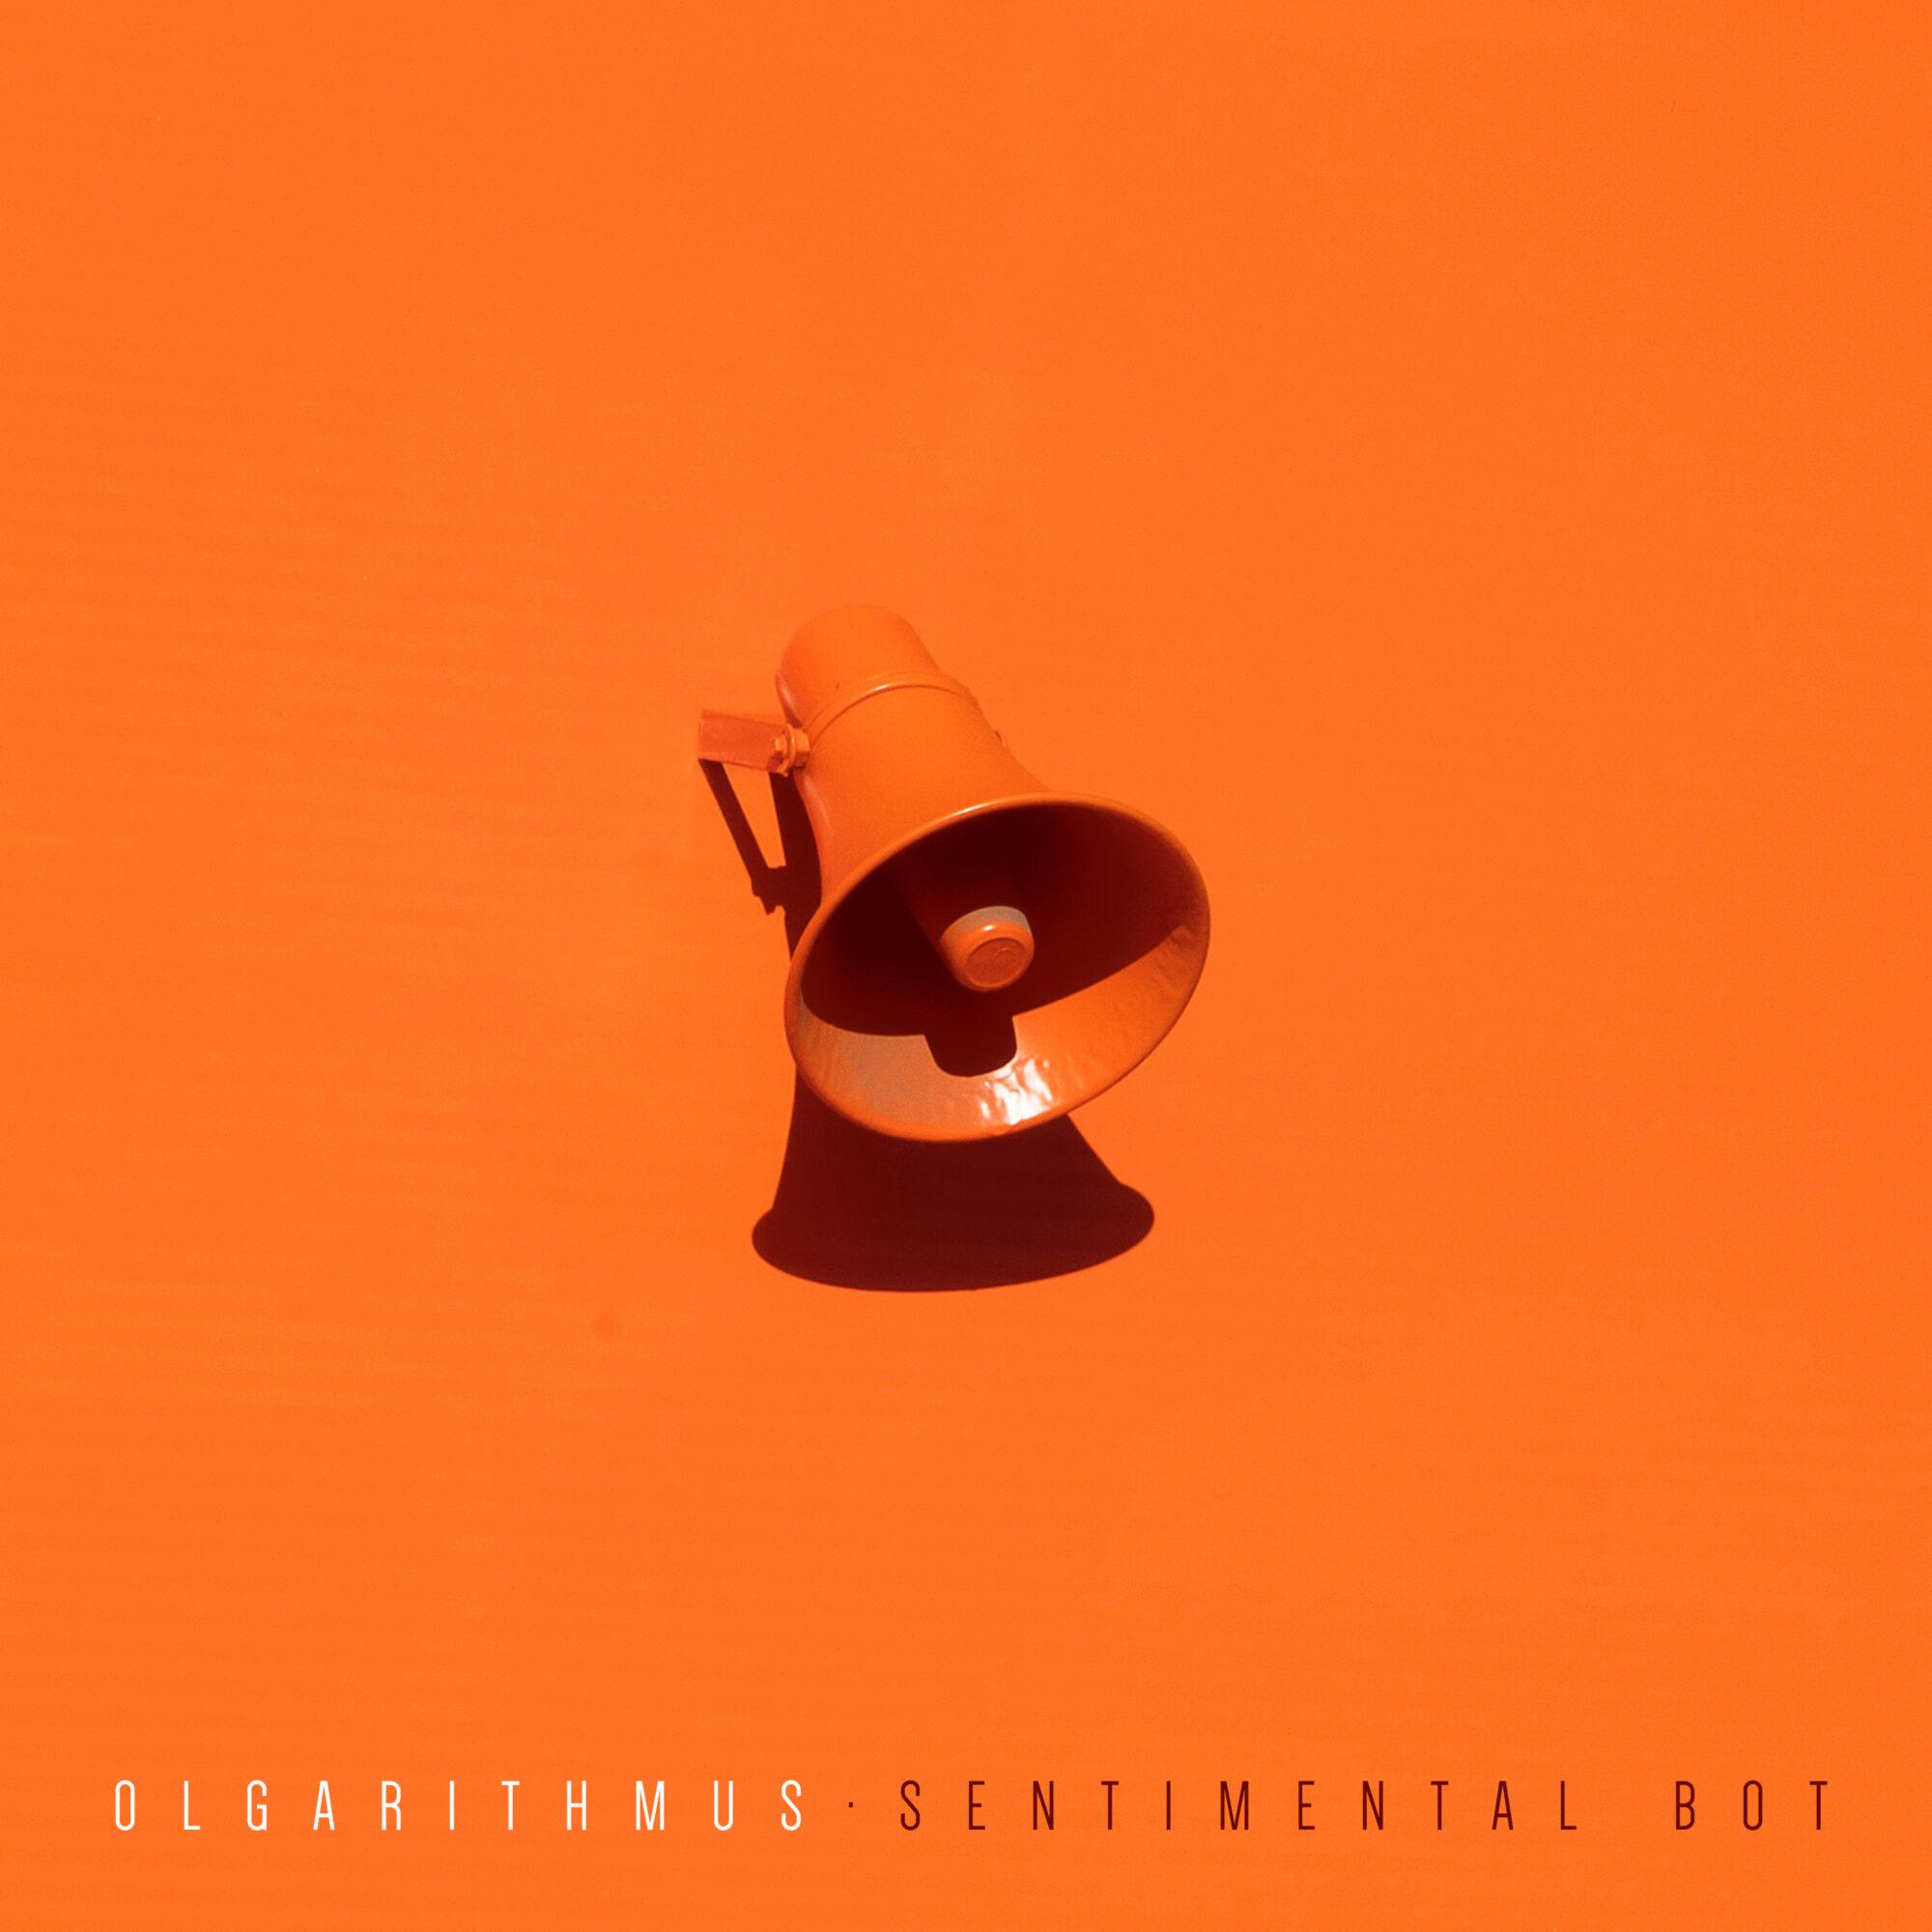 Olgarithmus - Sentimental Bot